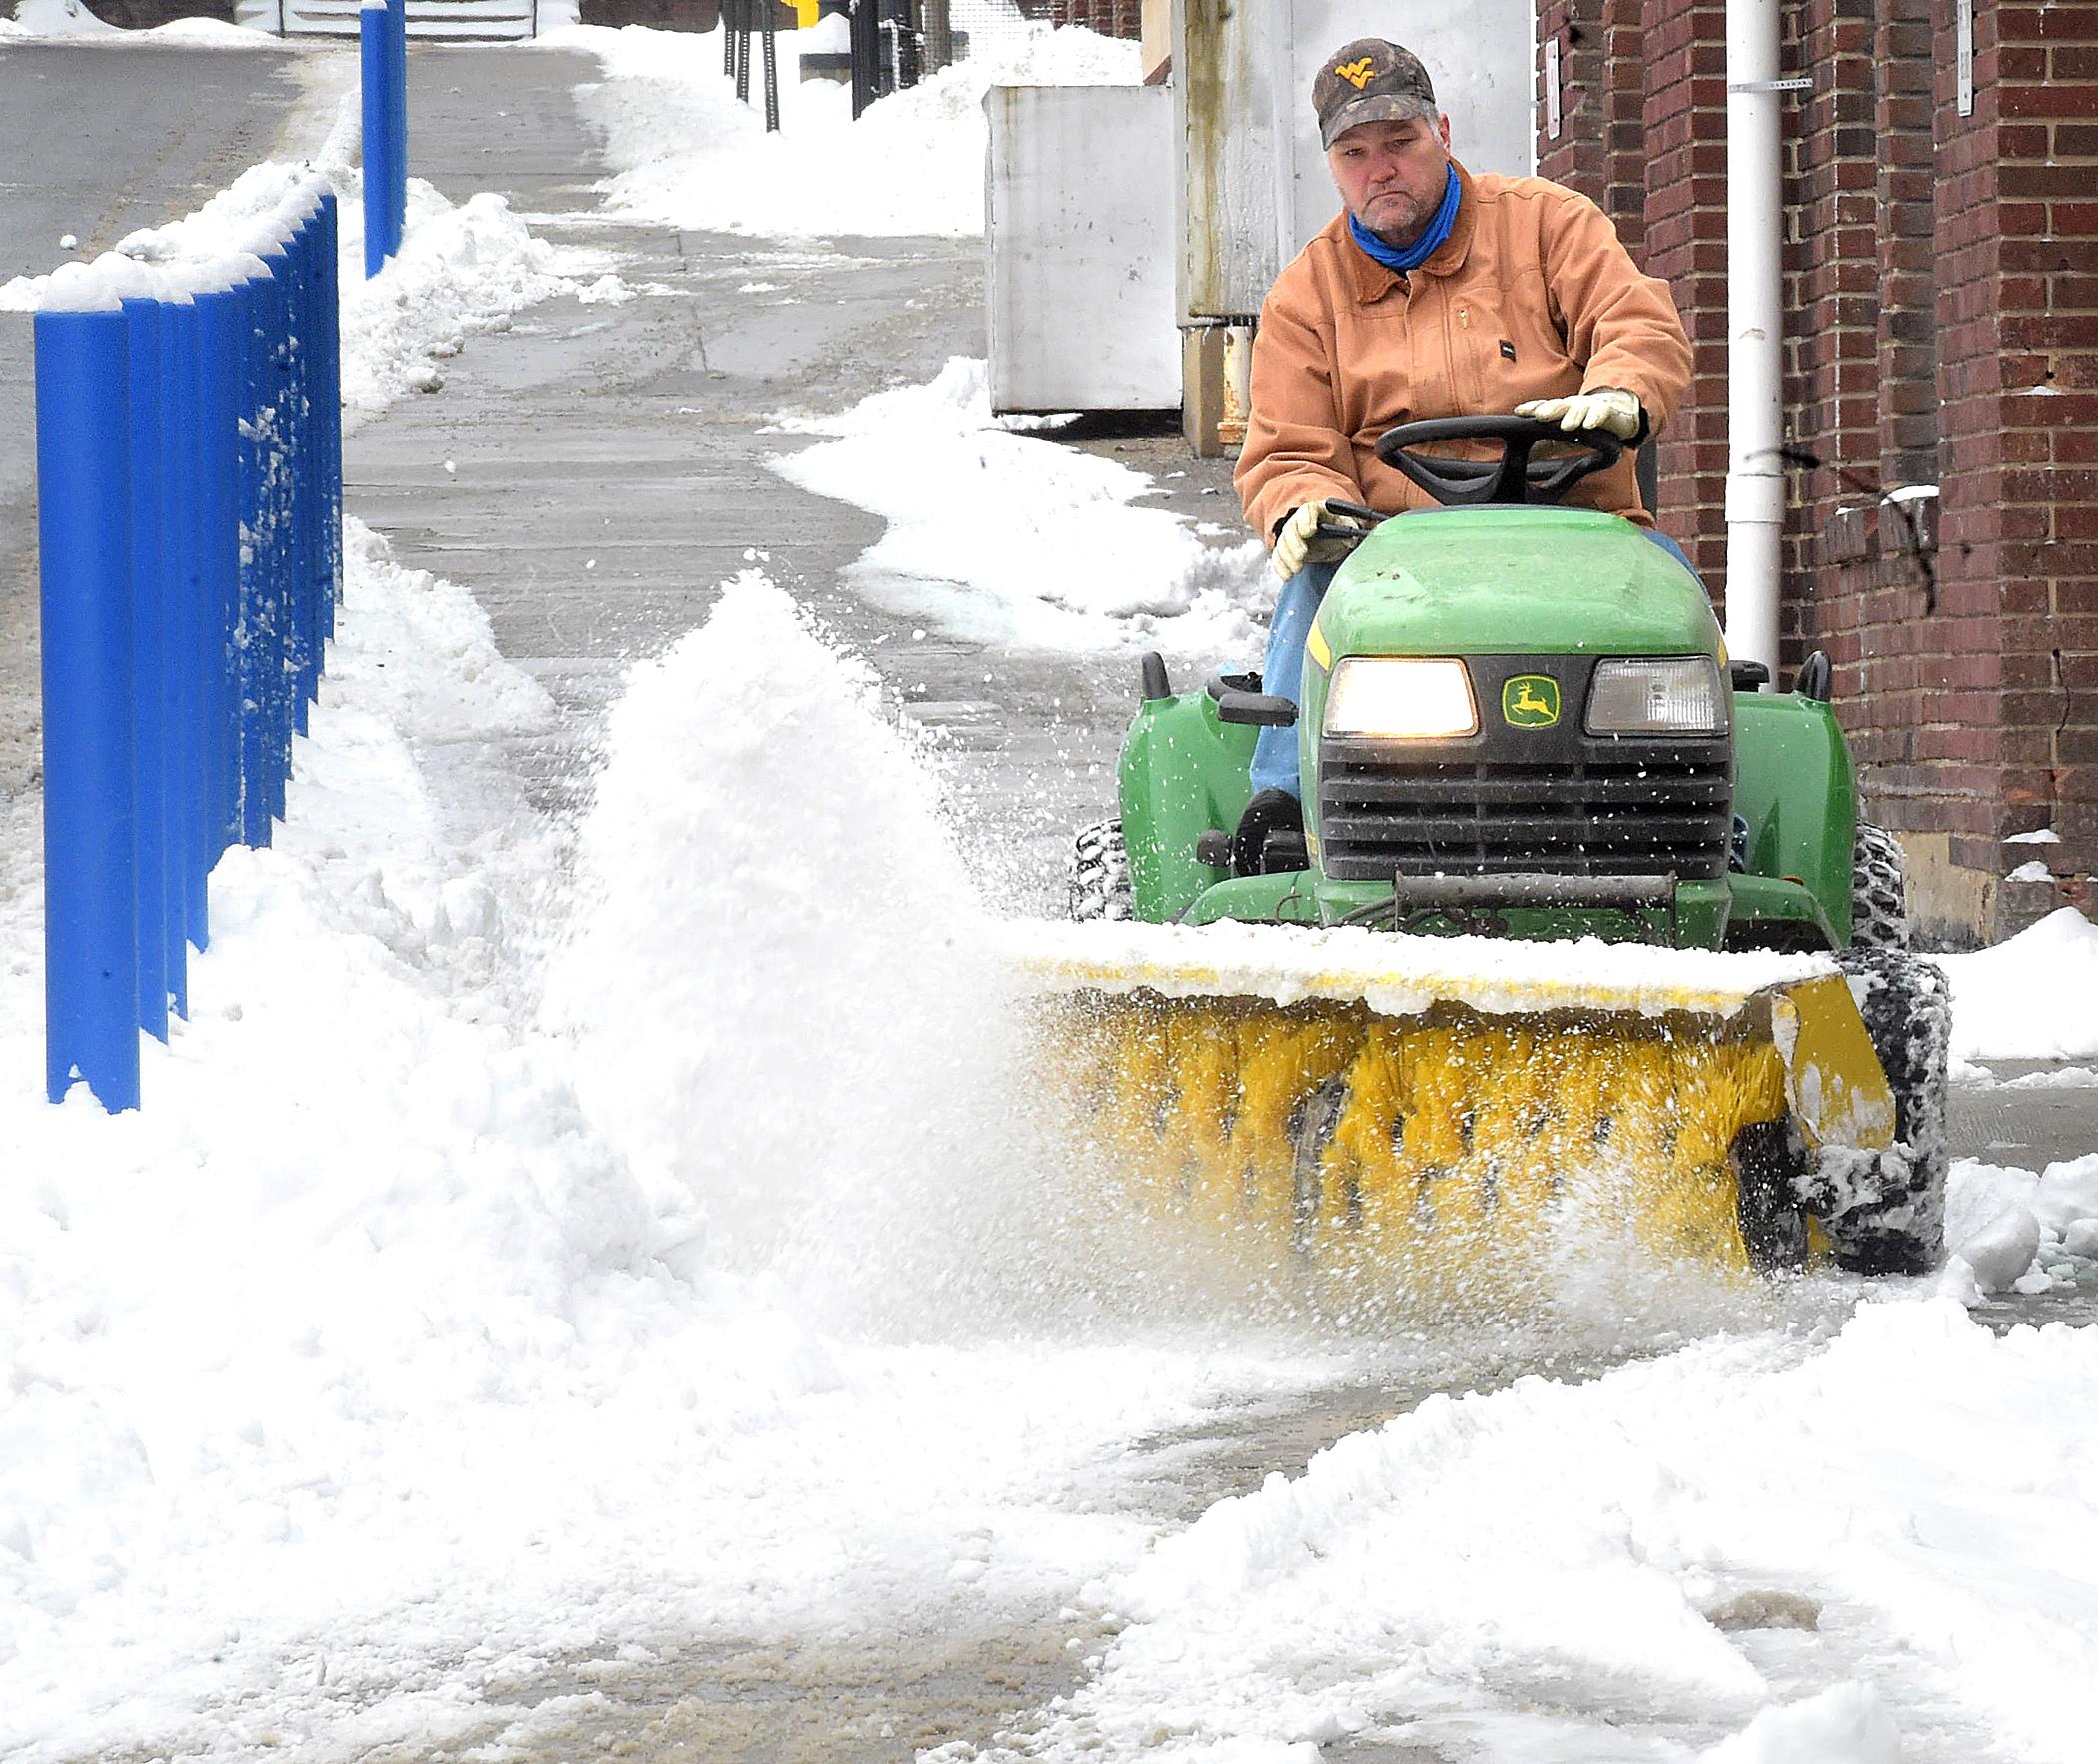 sweeping snow by Morgantown High School